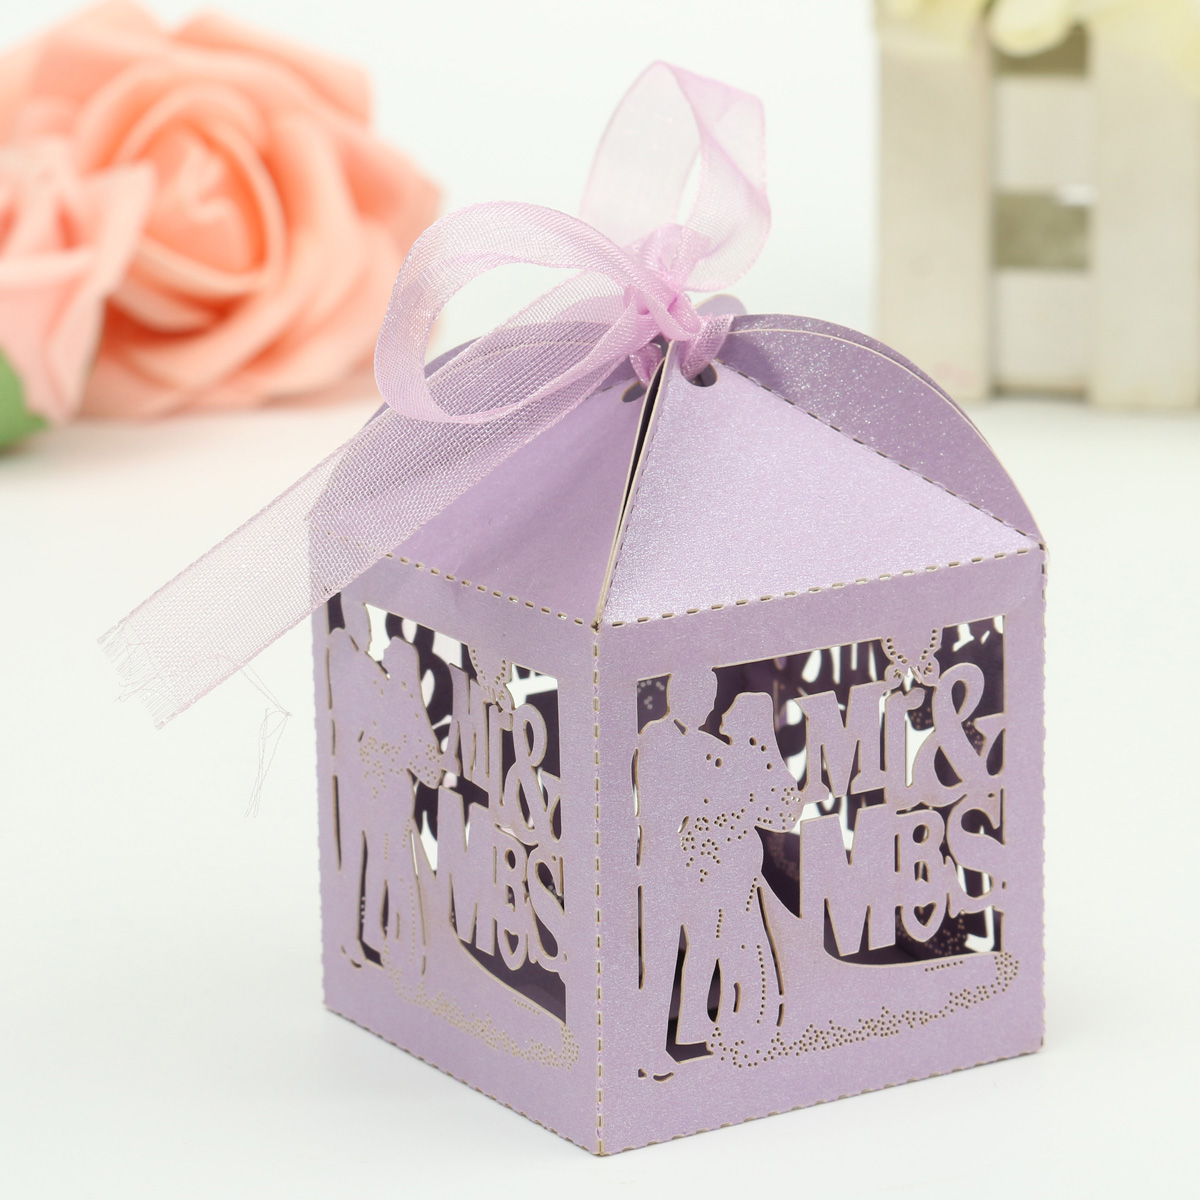 12pcs Mr & Mrs Laser Cut Party Wedding Favor Candy Gift Boxes LED Light Ribbon